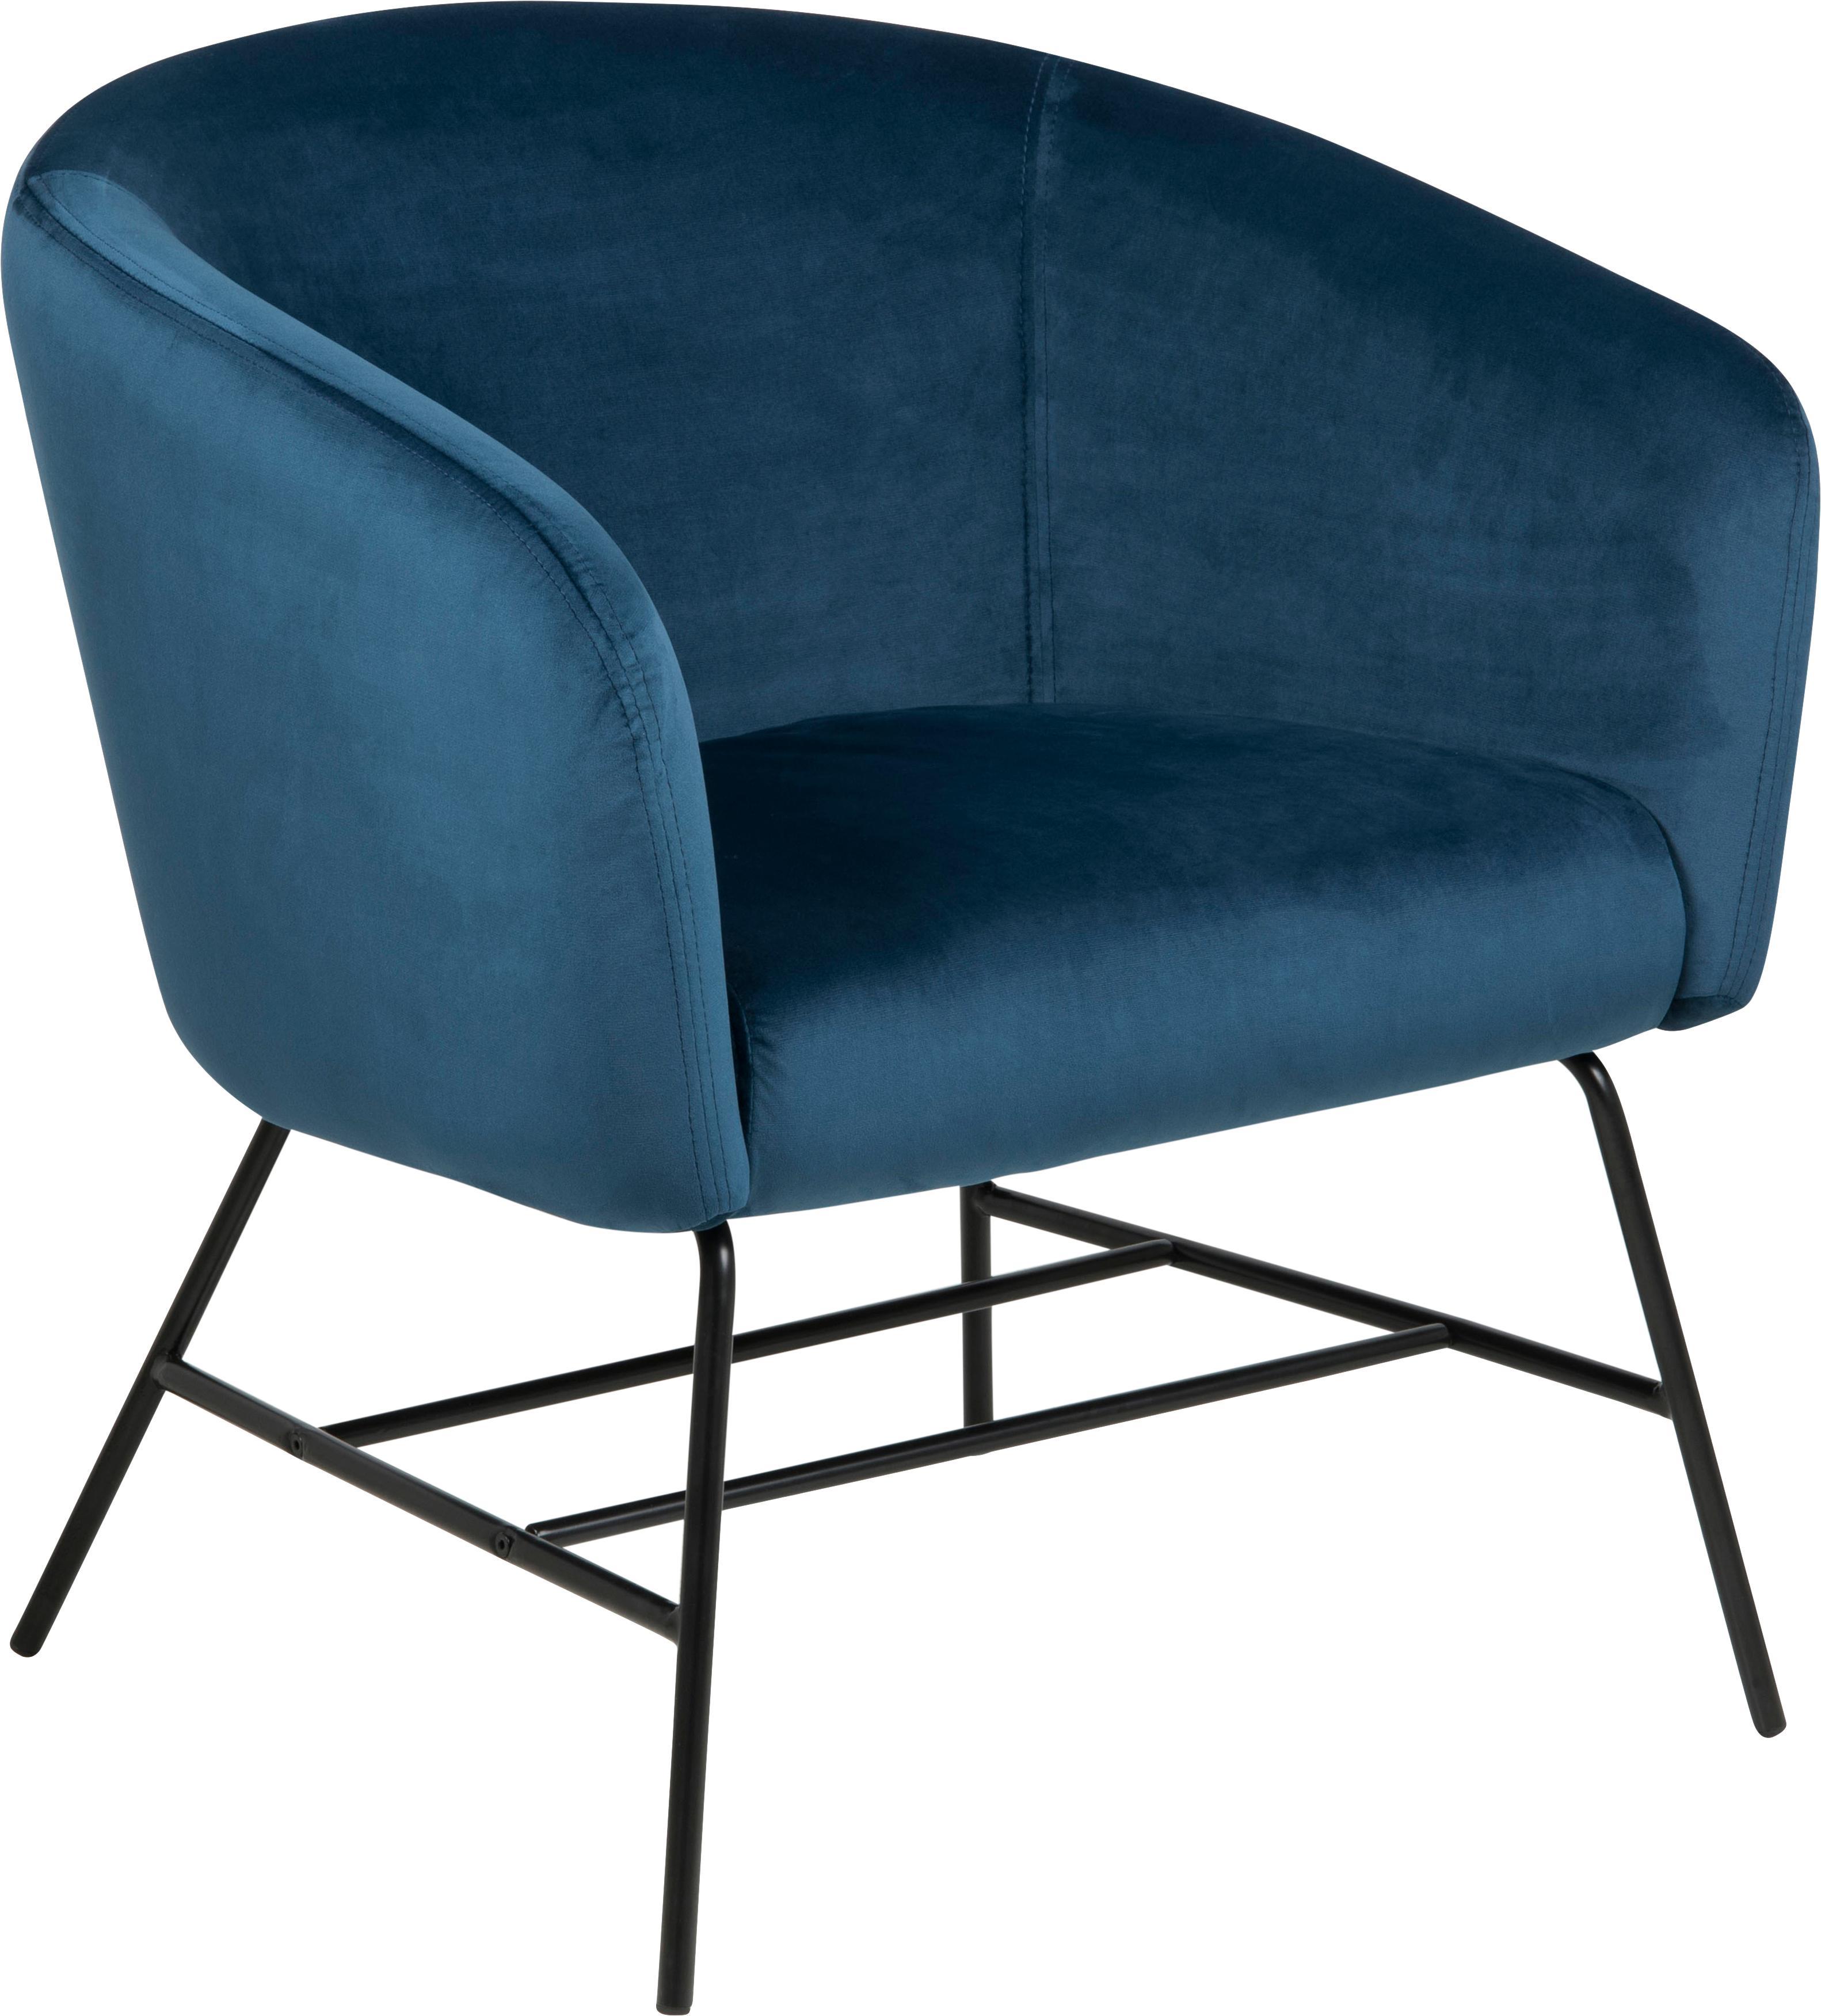 Moderne fluwelen fauteuil Ramsey in blauw, Bekleding: polyester fluweel, Poten: gelakt metaal, Fluweel marineblauw, B 72 x D 67 cm